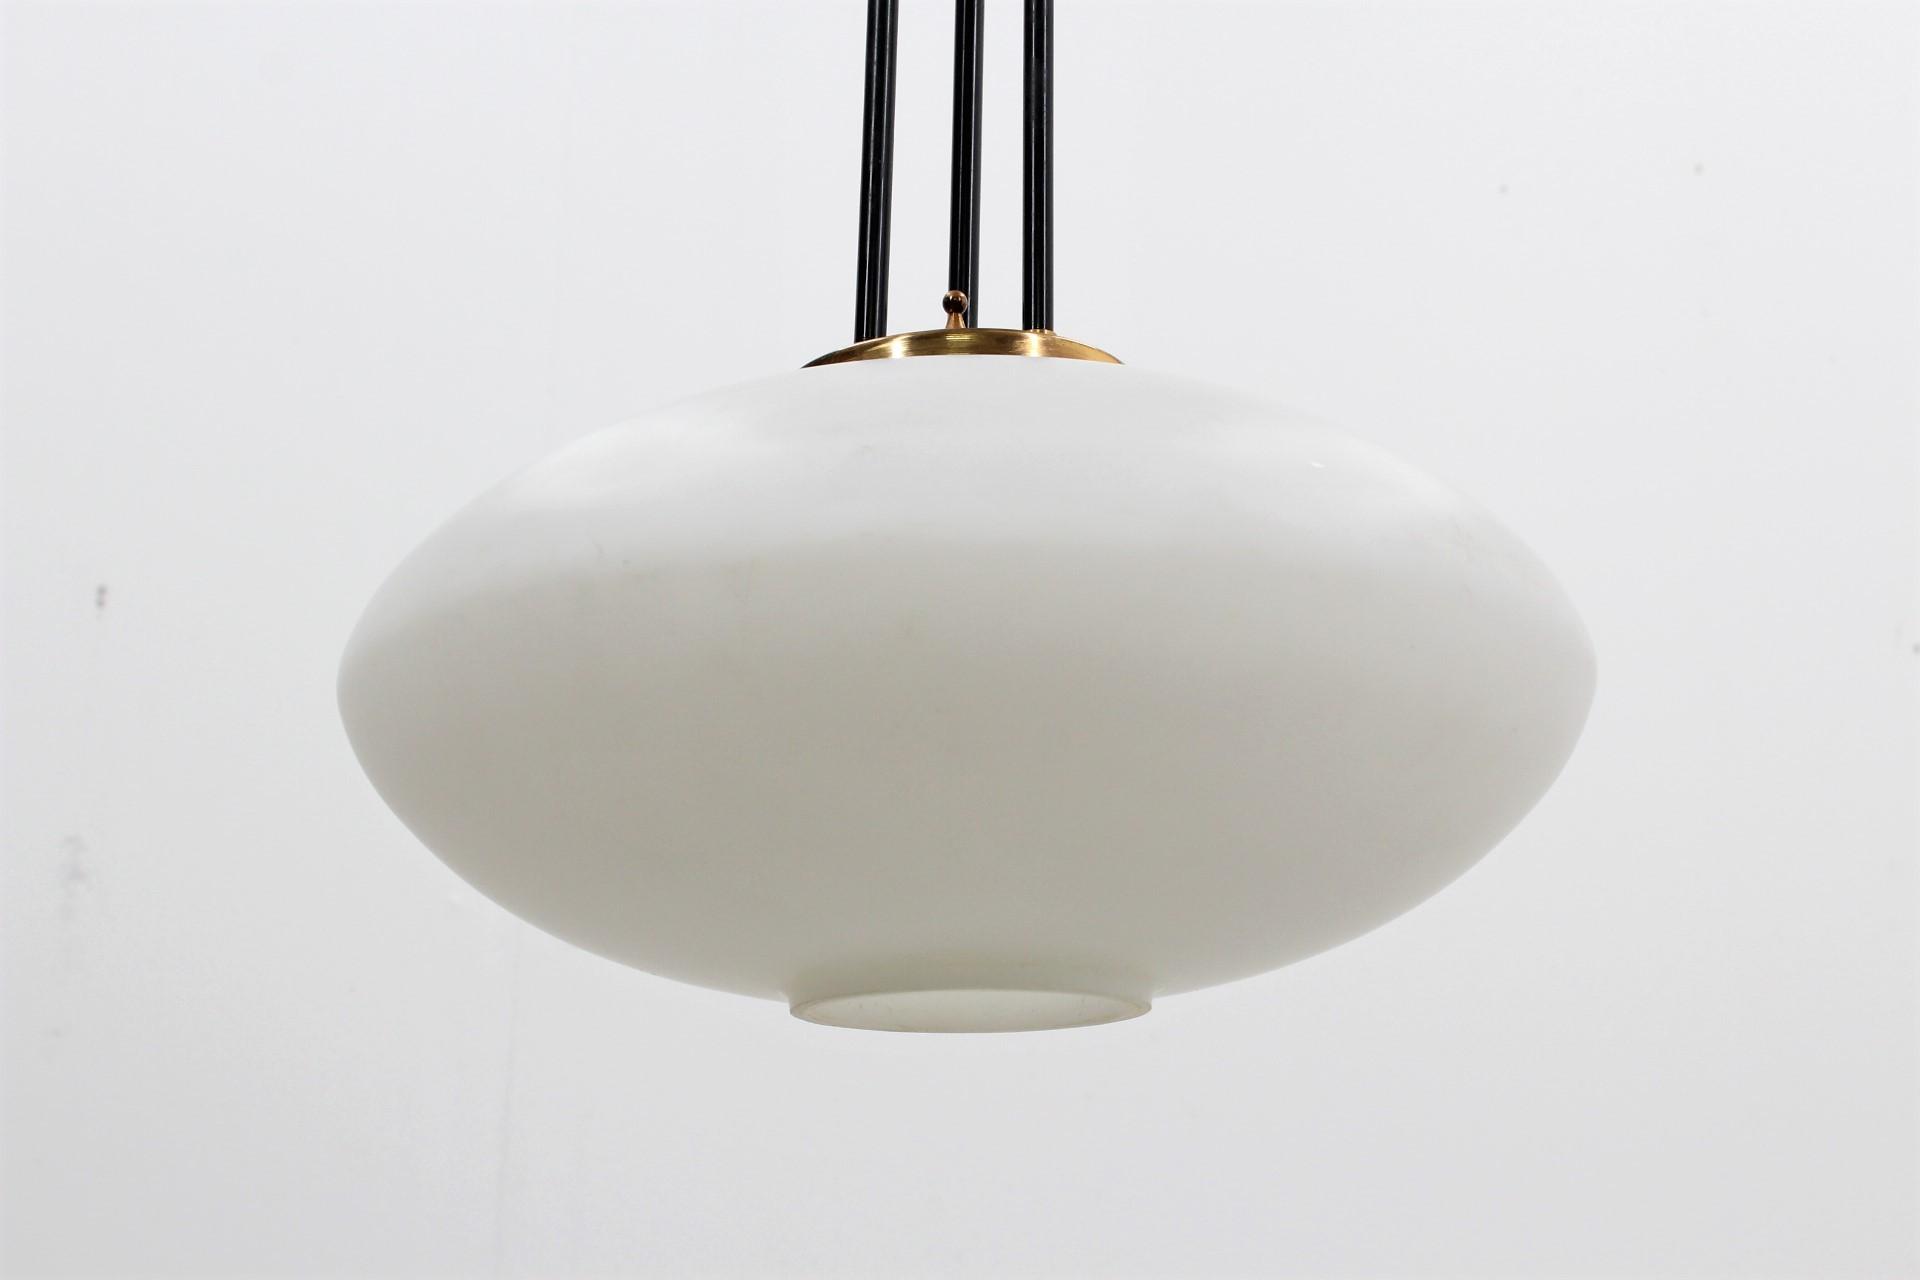 mid century pendant lighting. Mid-century Italian Pendant Lamp From Stilnovo - 1950s. Previous Next Mid Century Lighting I